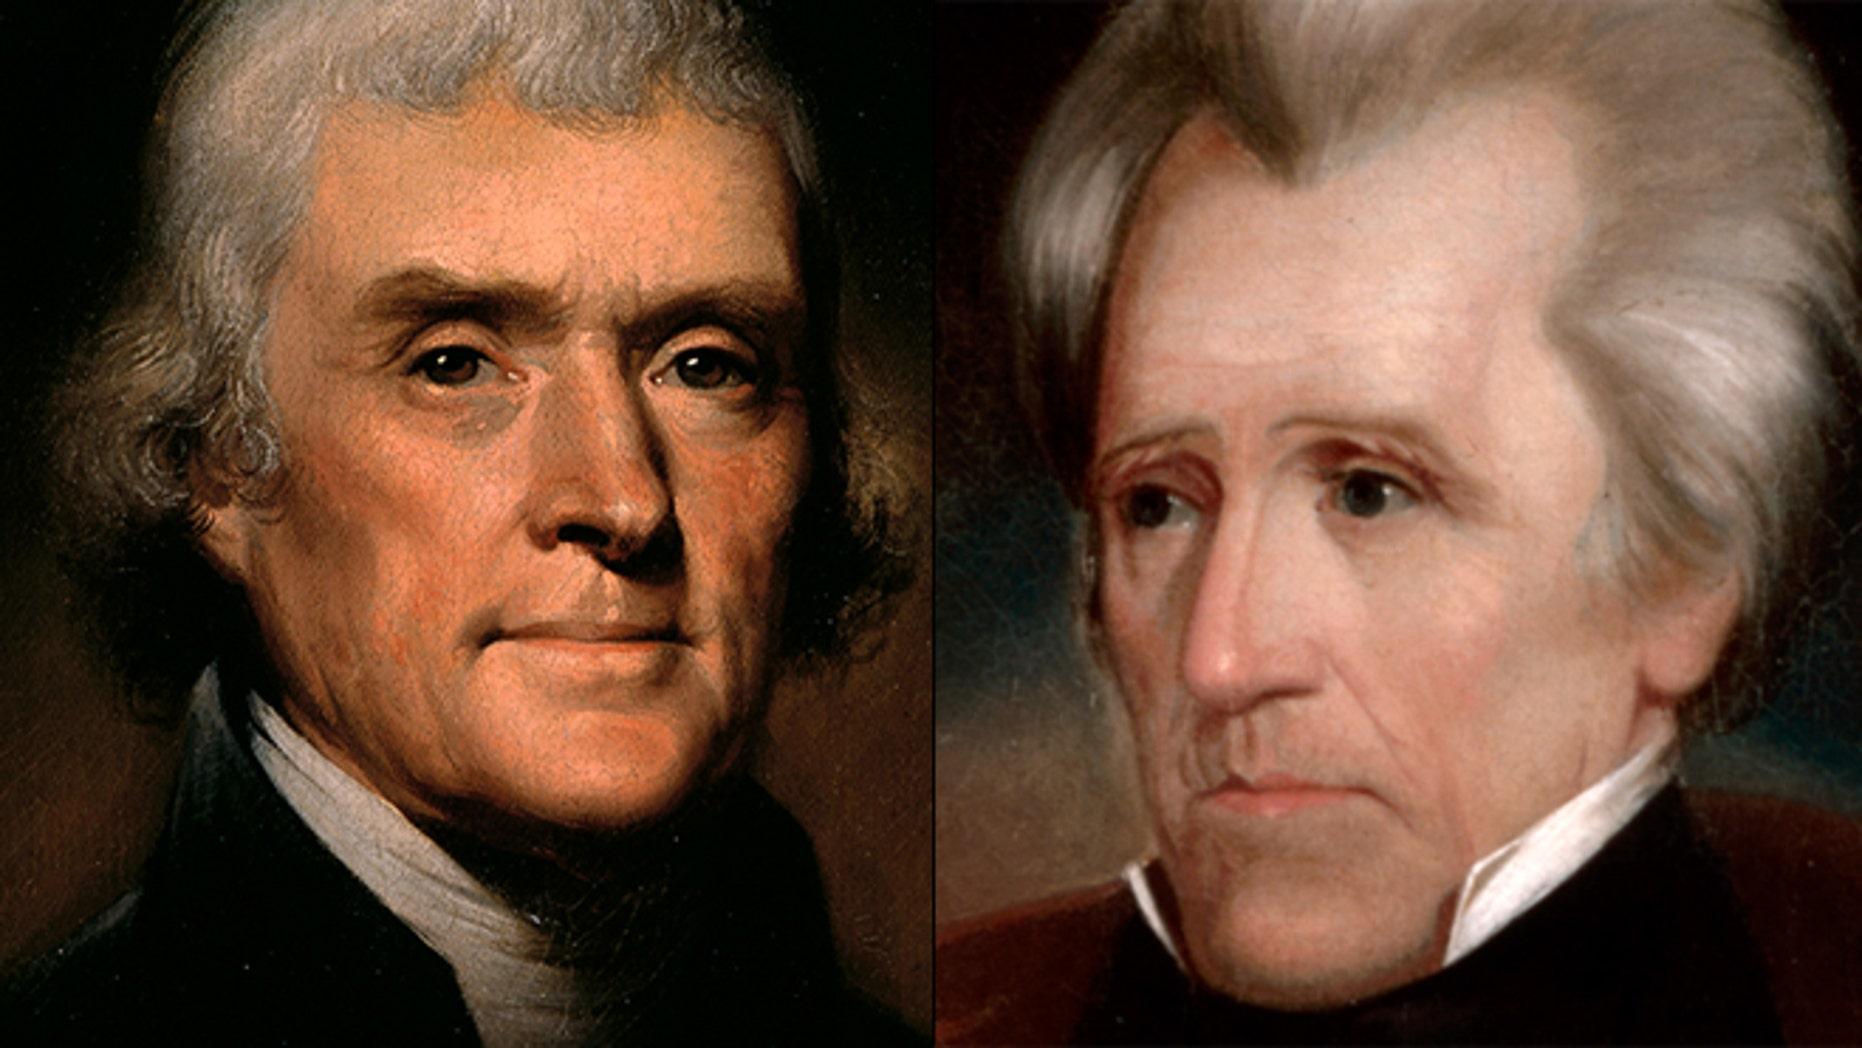 At left, portrait of President Thomas Jefferson; at right, portrait of President Andrew Jackson.